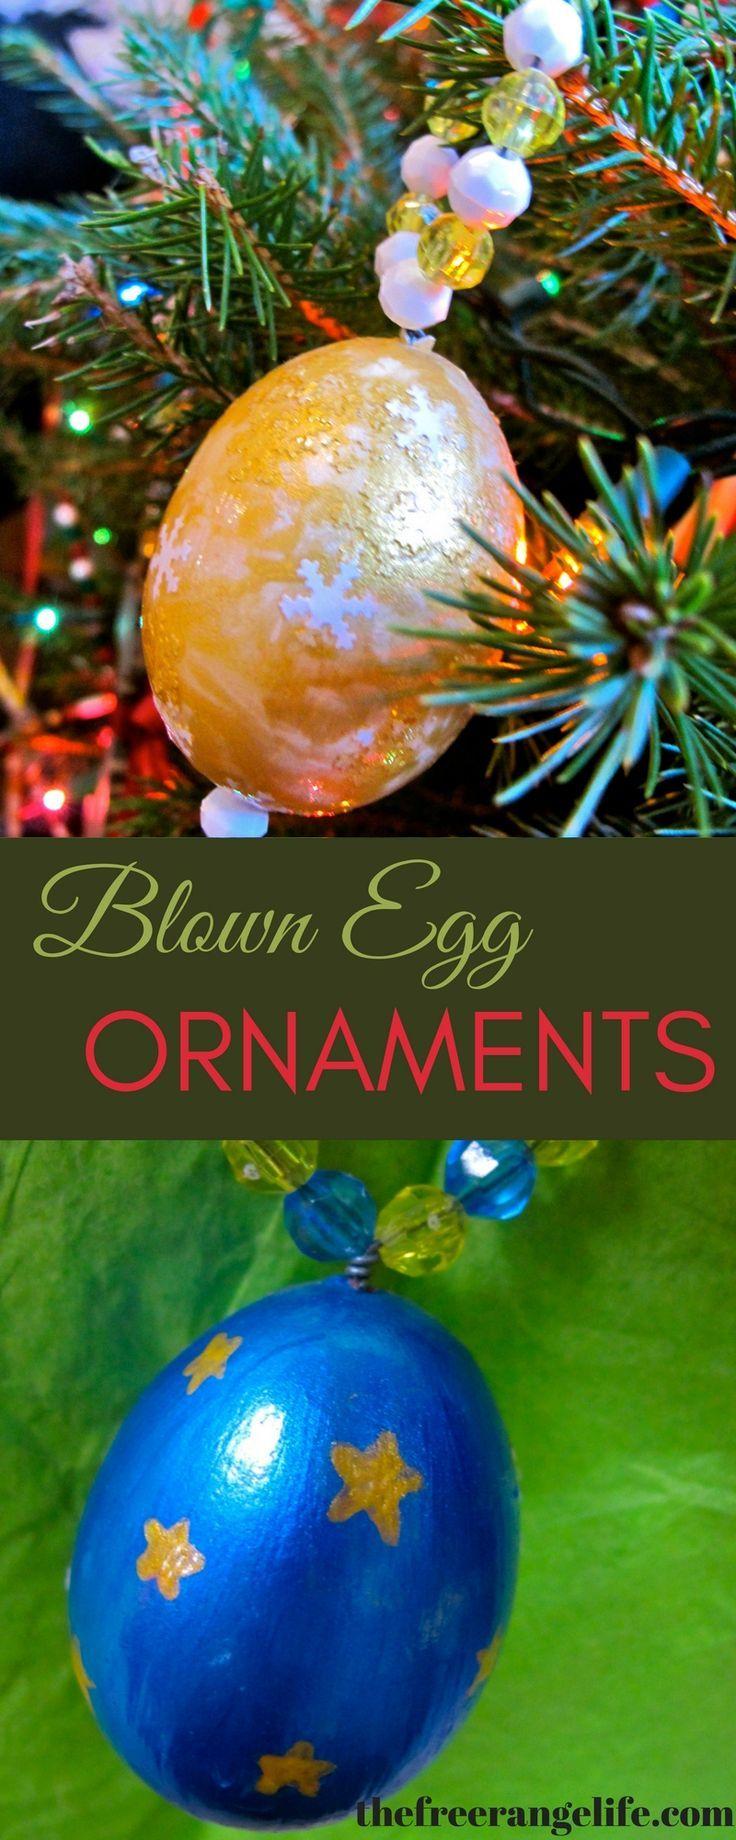 Diy Christmas Blown Egg Ornaments Christmas Ornaments To Make